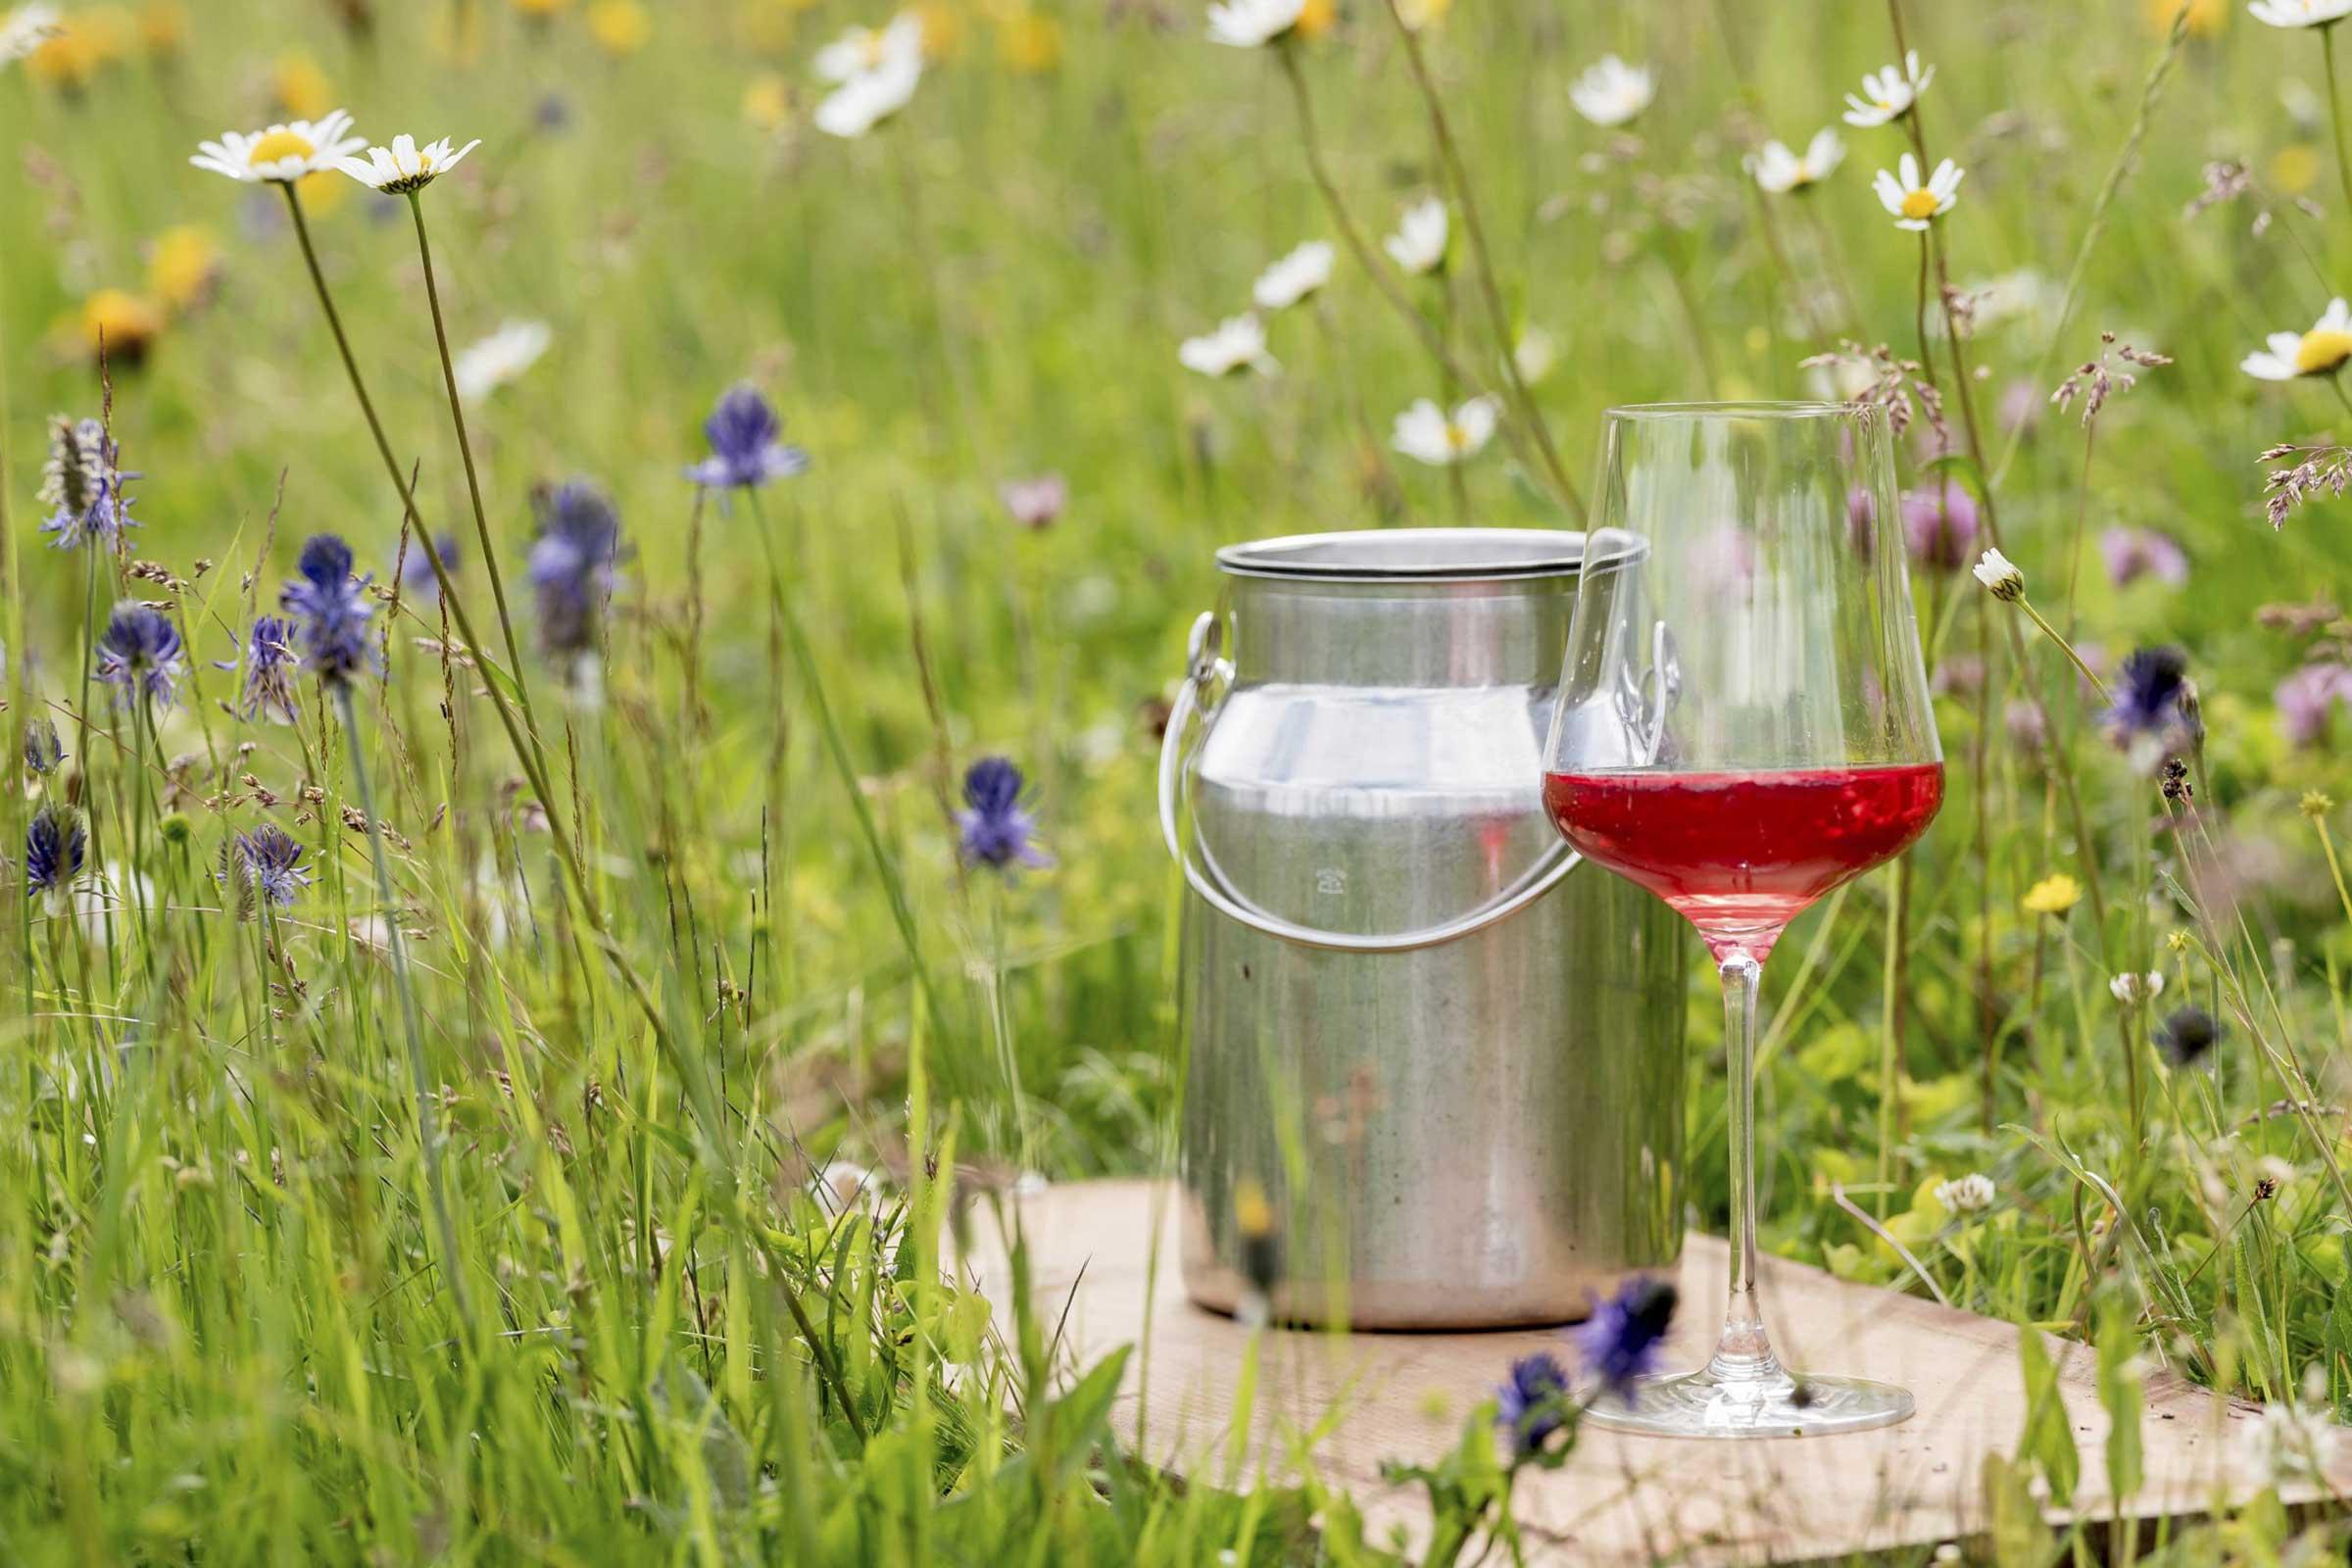 Weinglas in Wiese - Haiminger Markttage